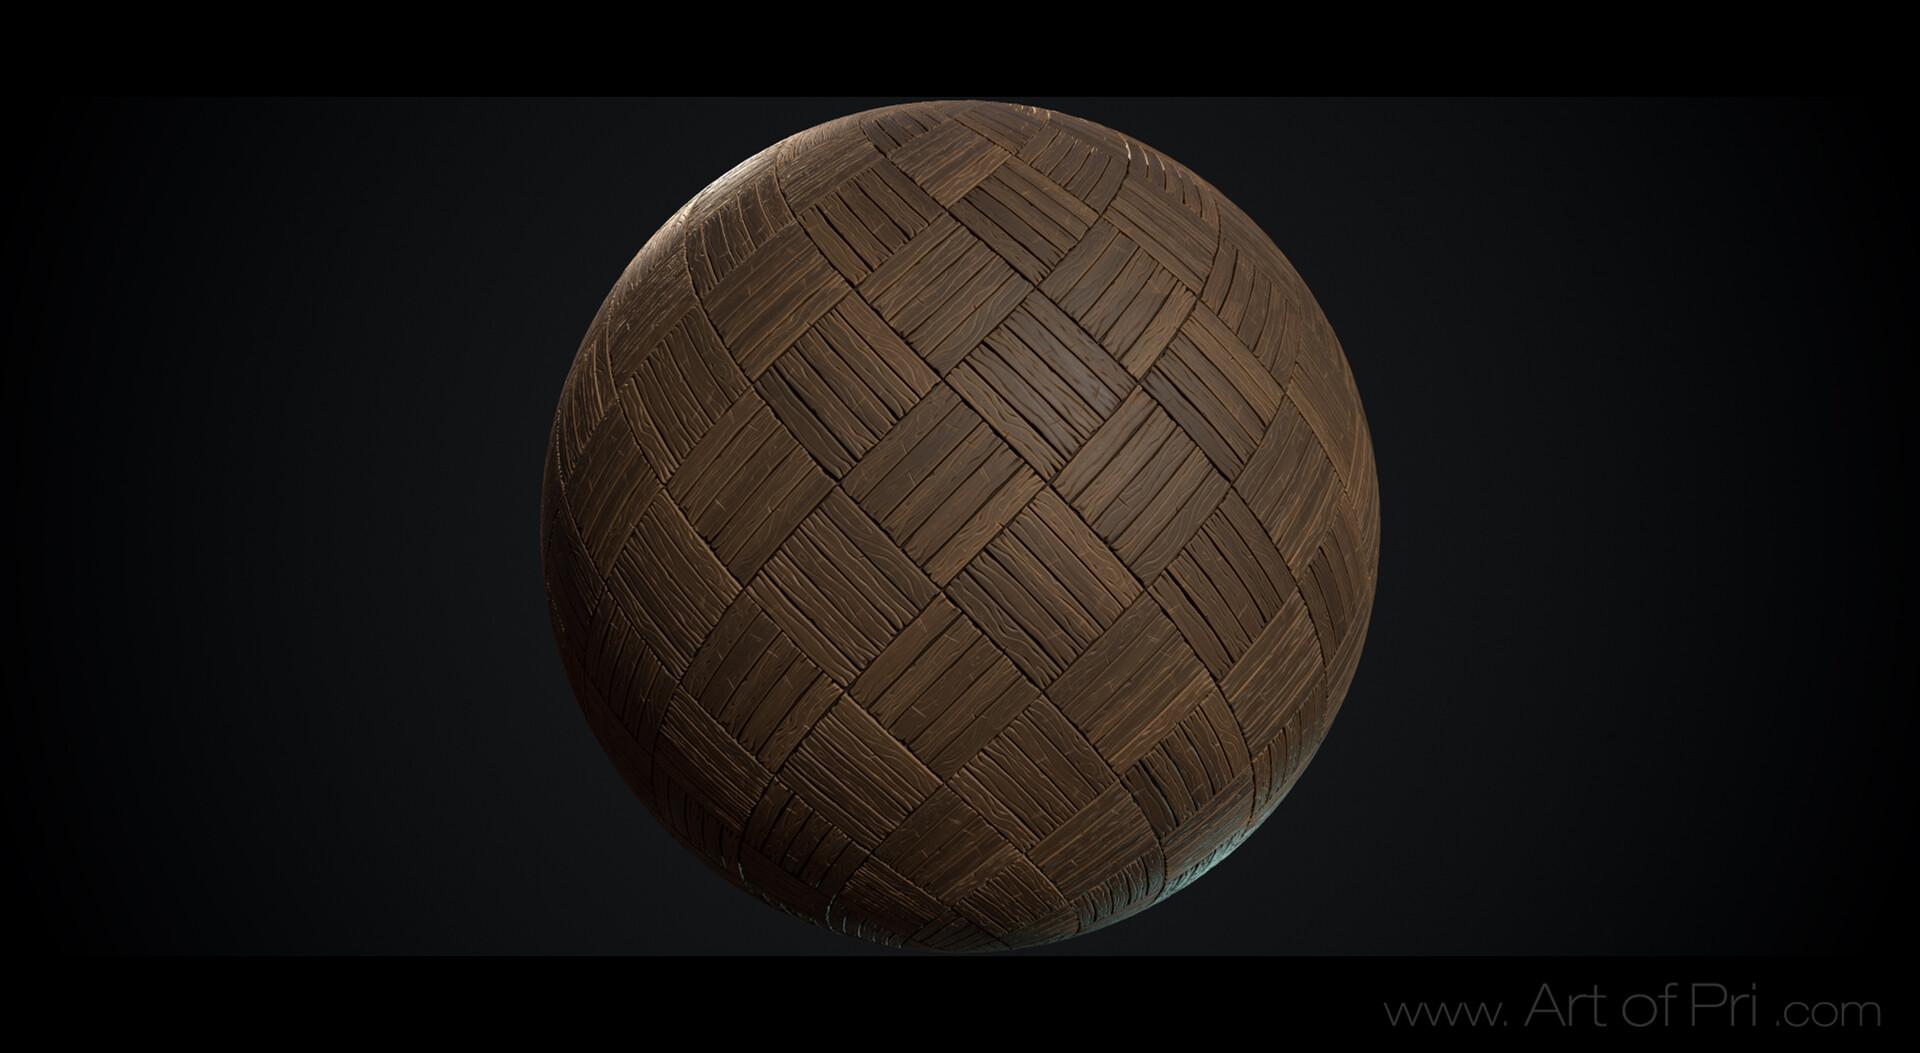 Design: Diagonal Basket